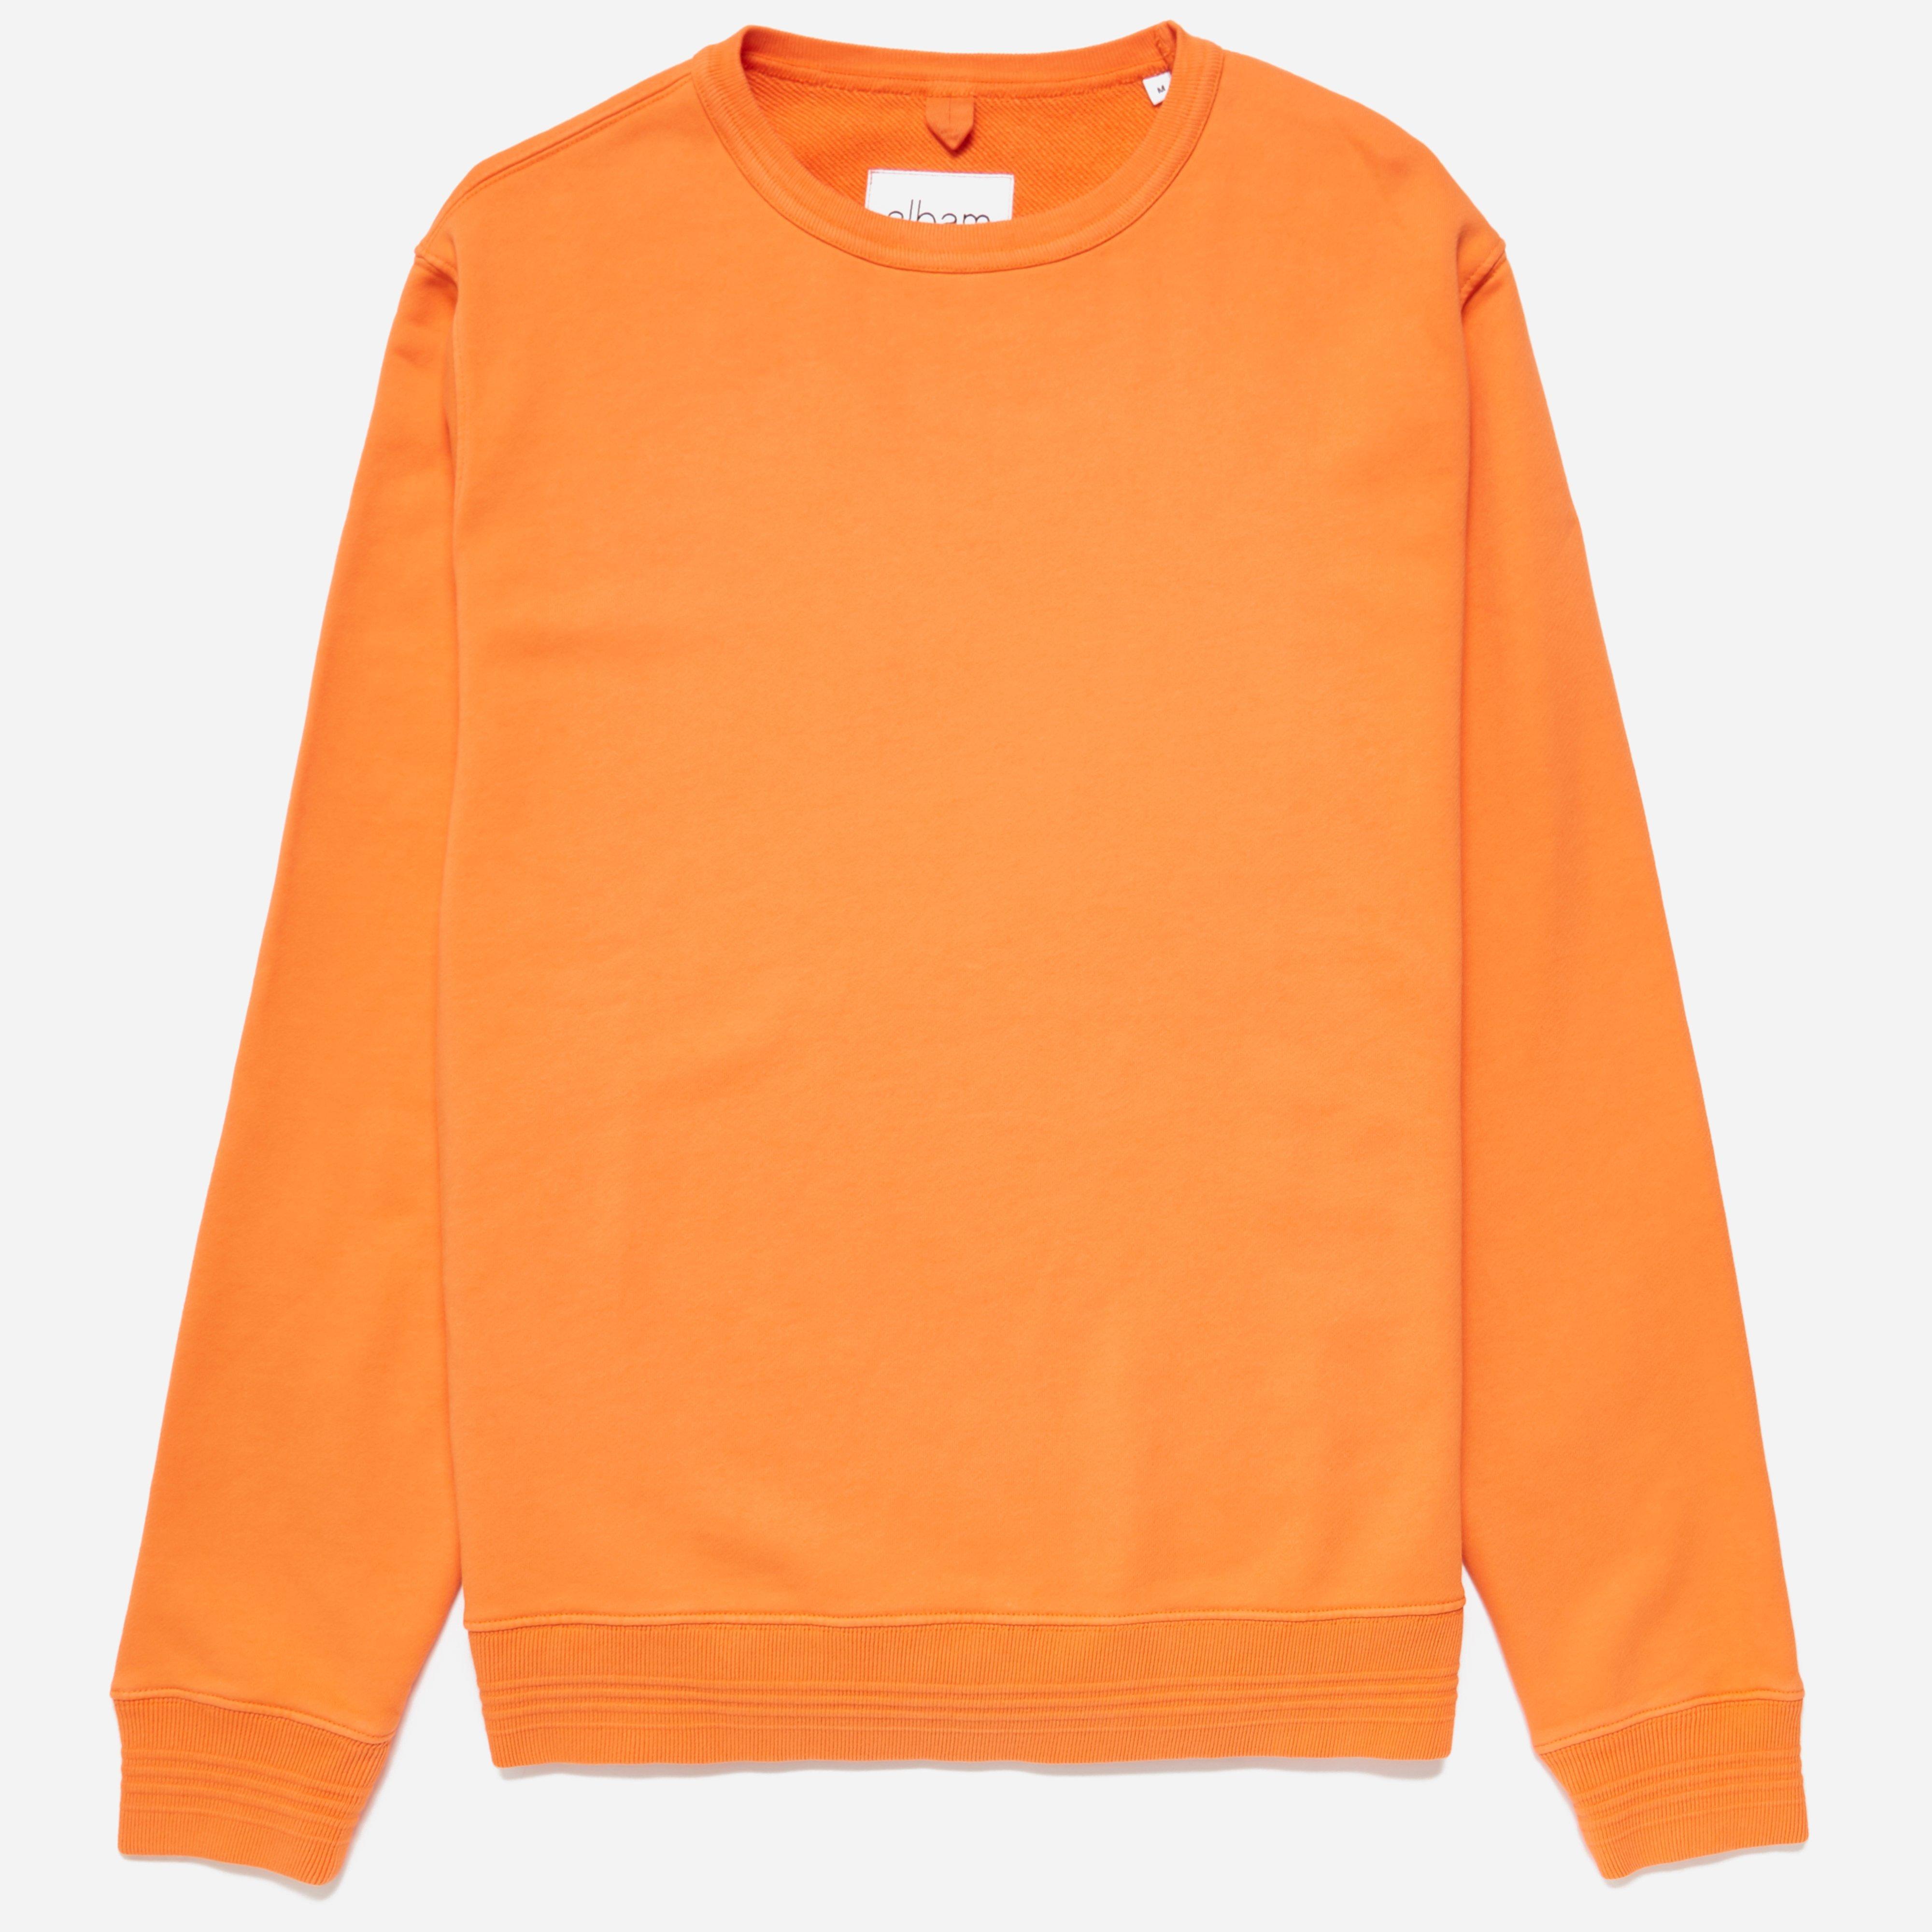 Albam Sports Sweatshirt